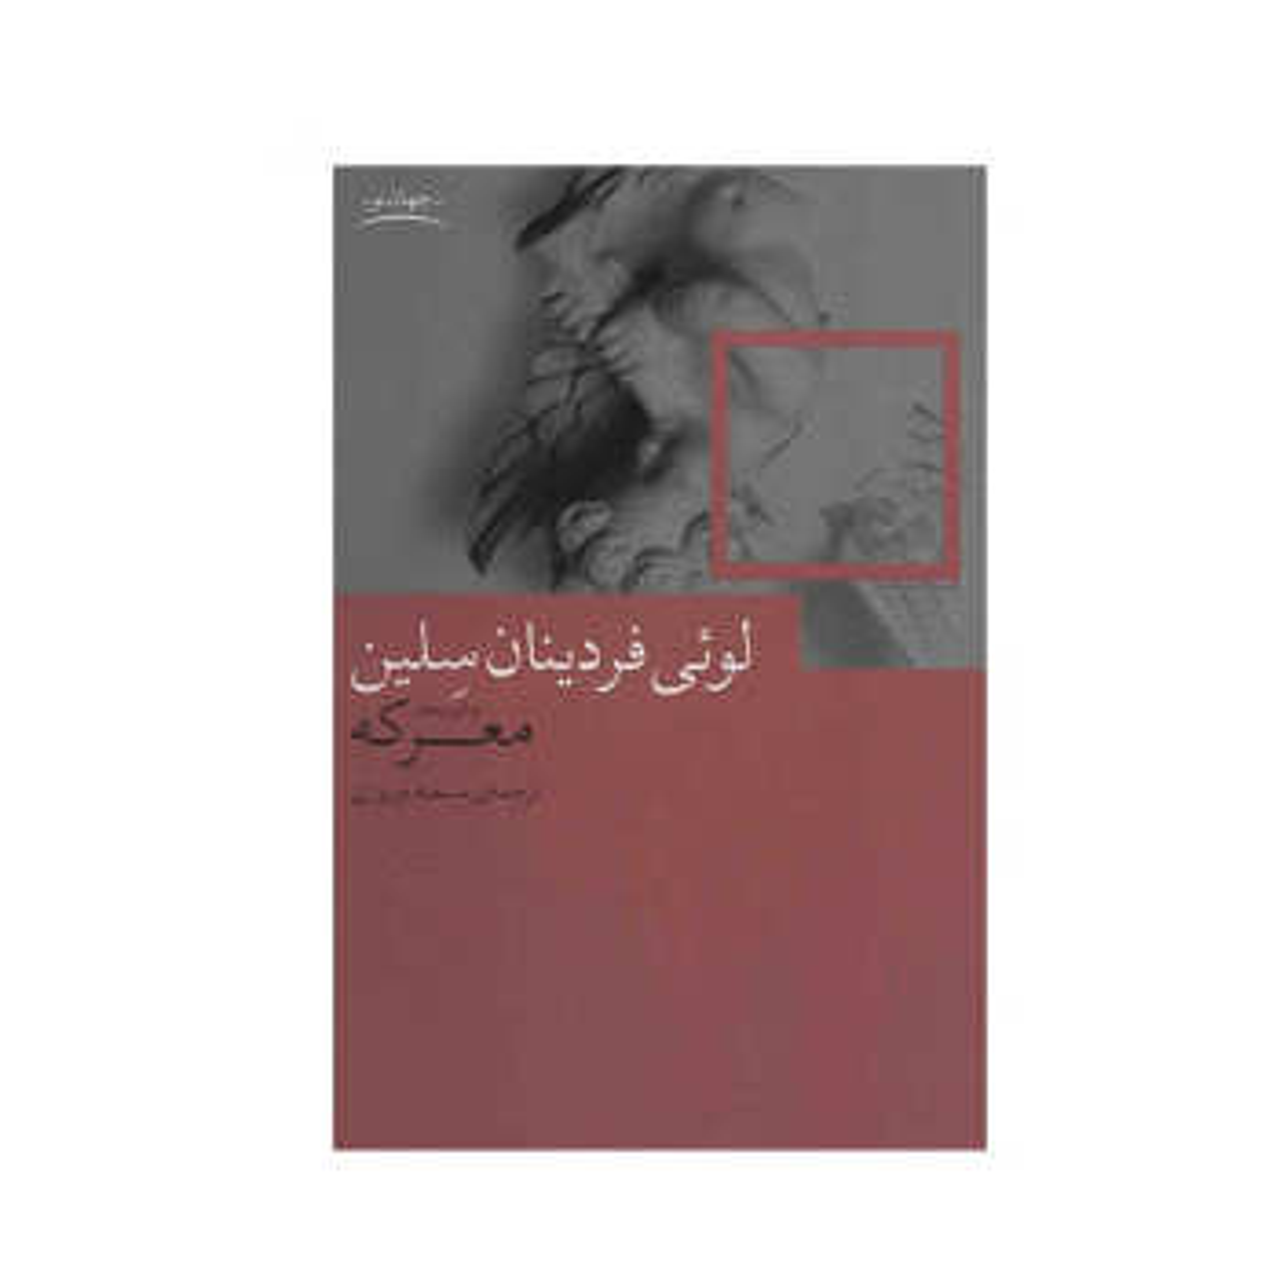 کتاب معرکه اثر لوئی فردینان سلین